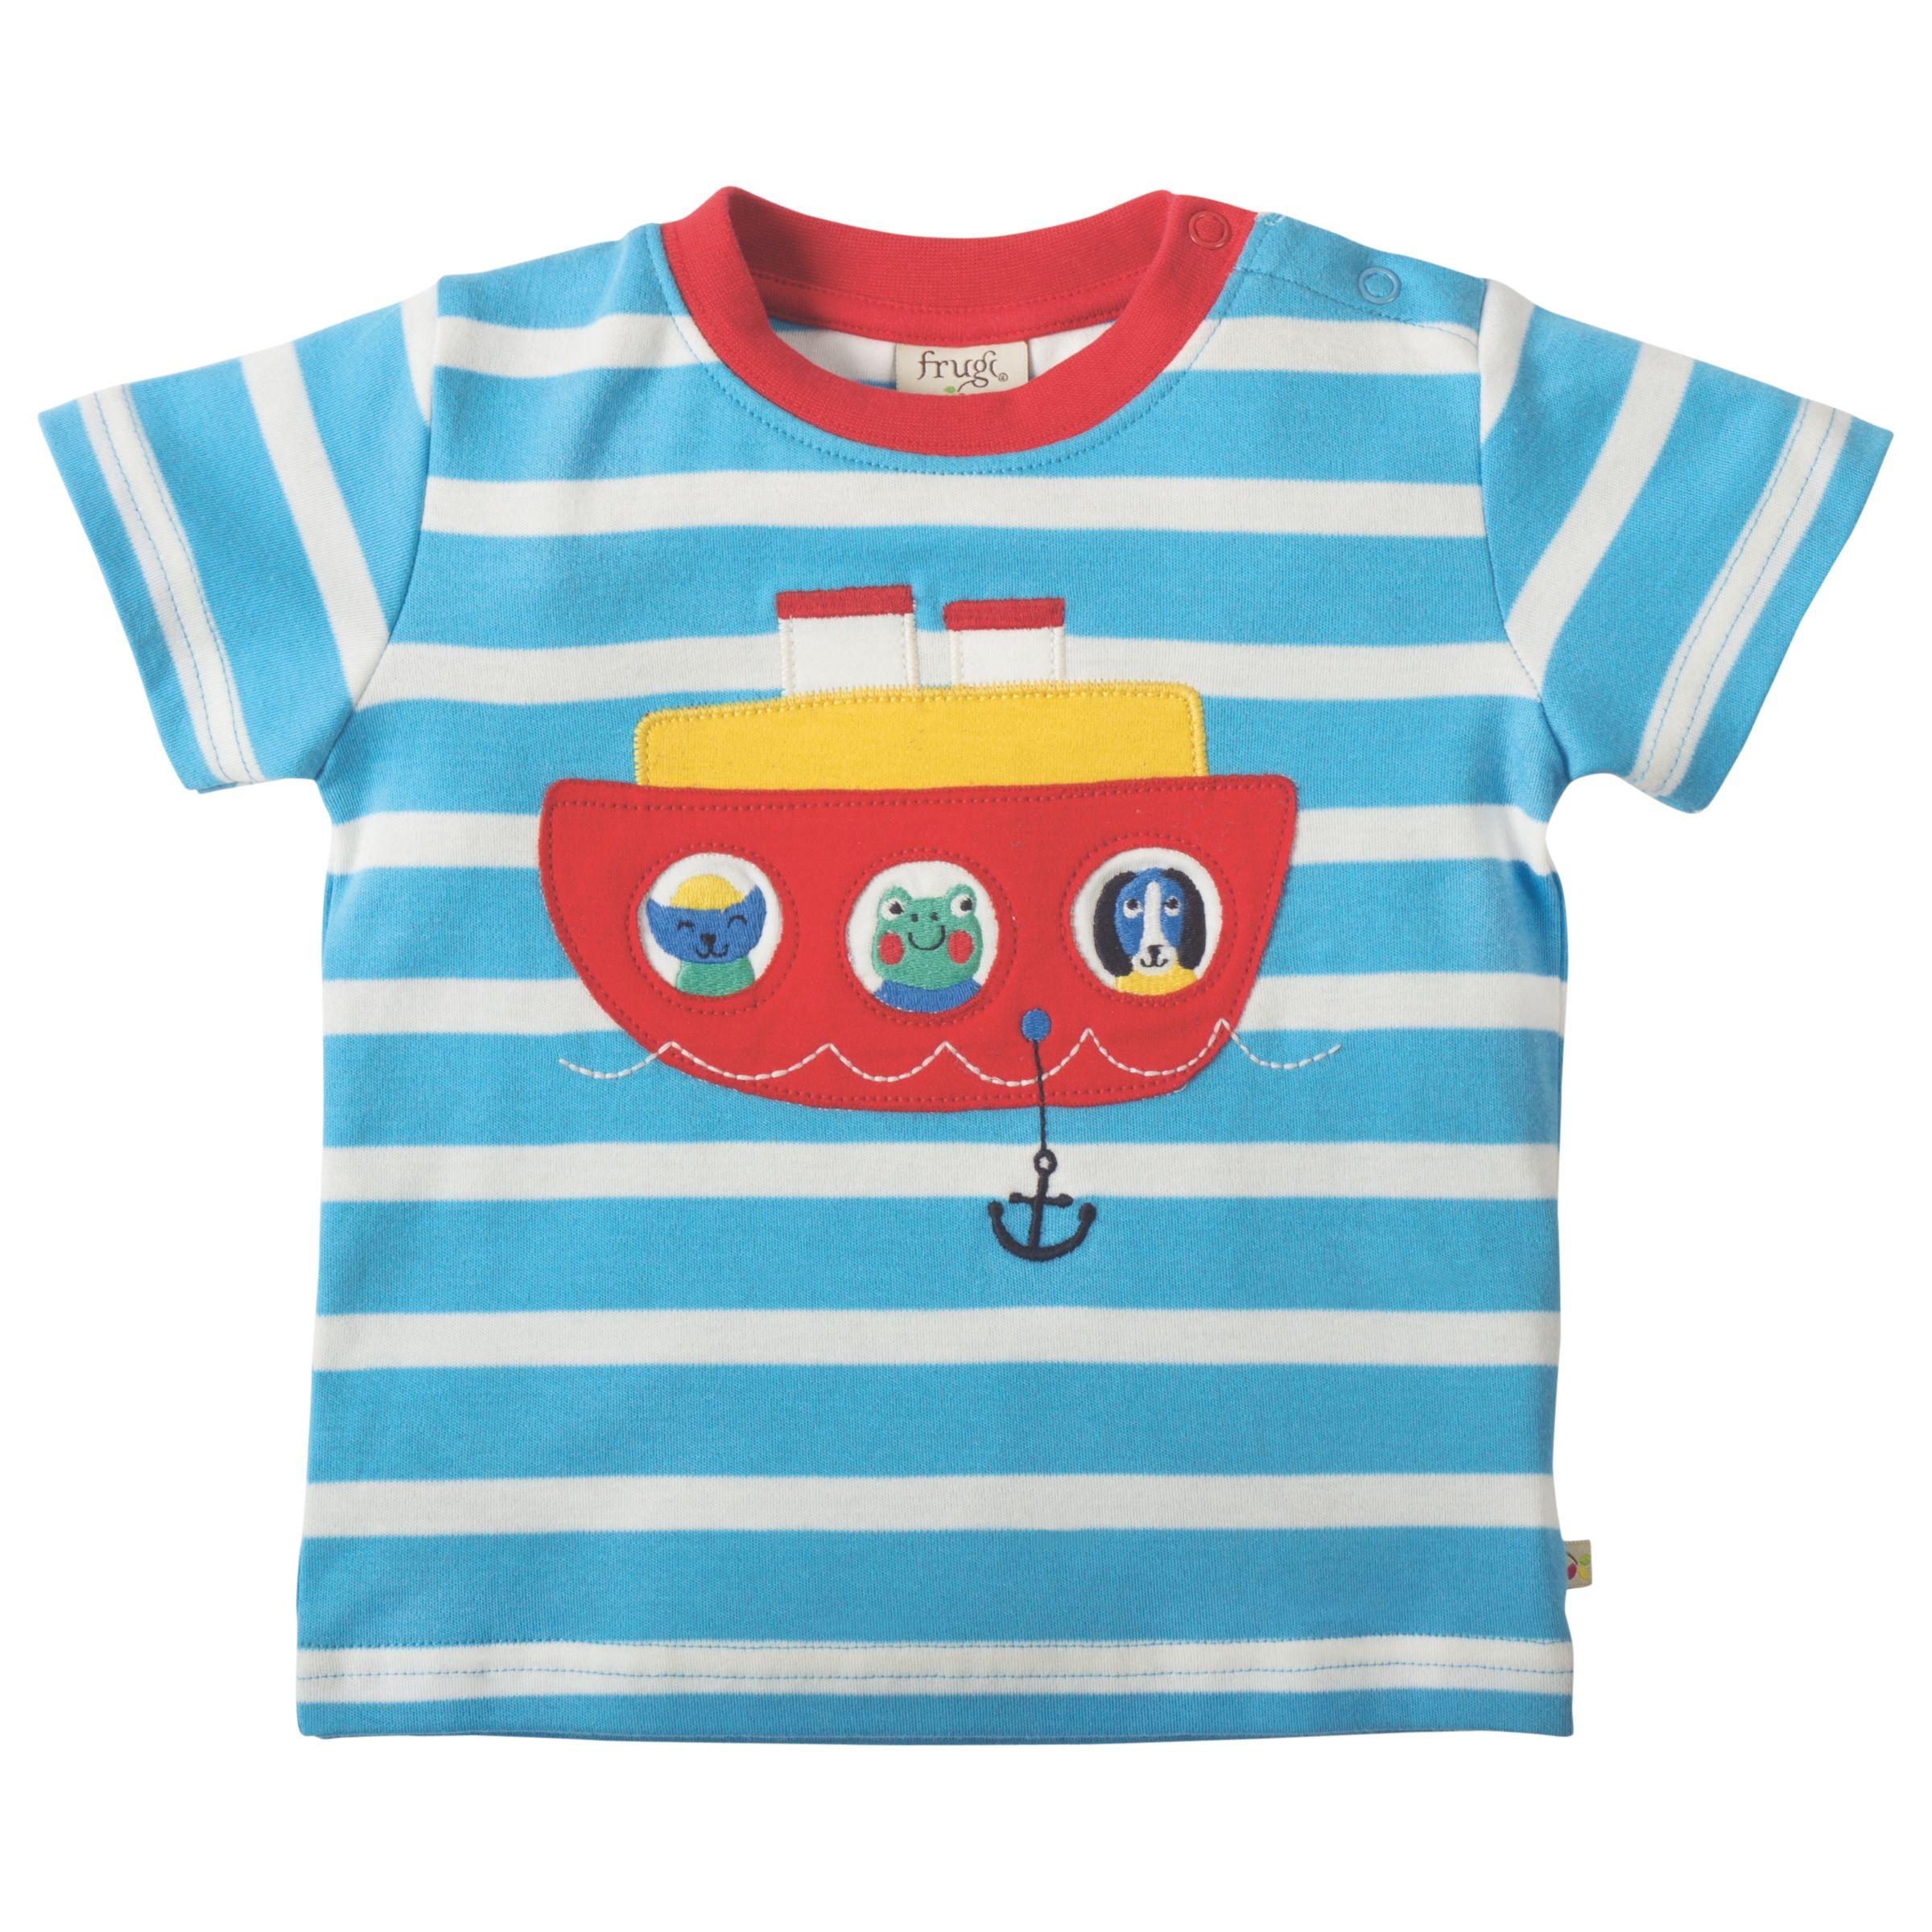 Frugi Organic Frugi Organic Baby Little Fal Applique Boat Short Sleeve Top, Blue/White